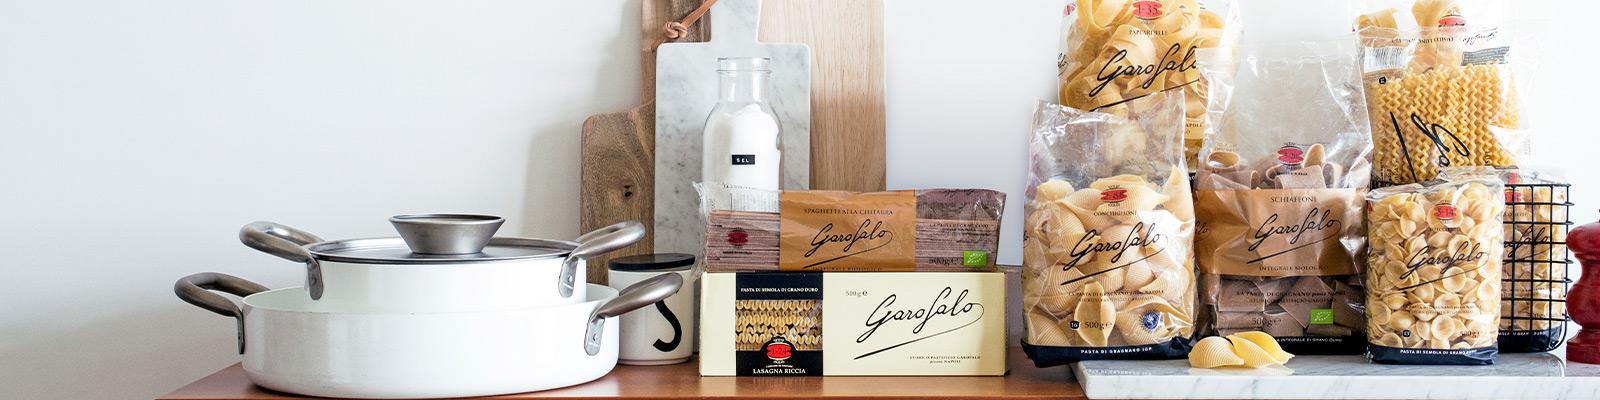 Pasta Garofalo - Specialvarianter